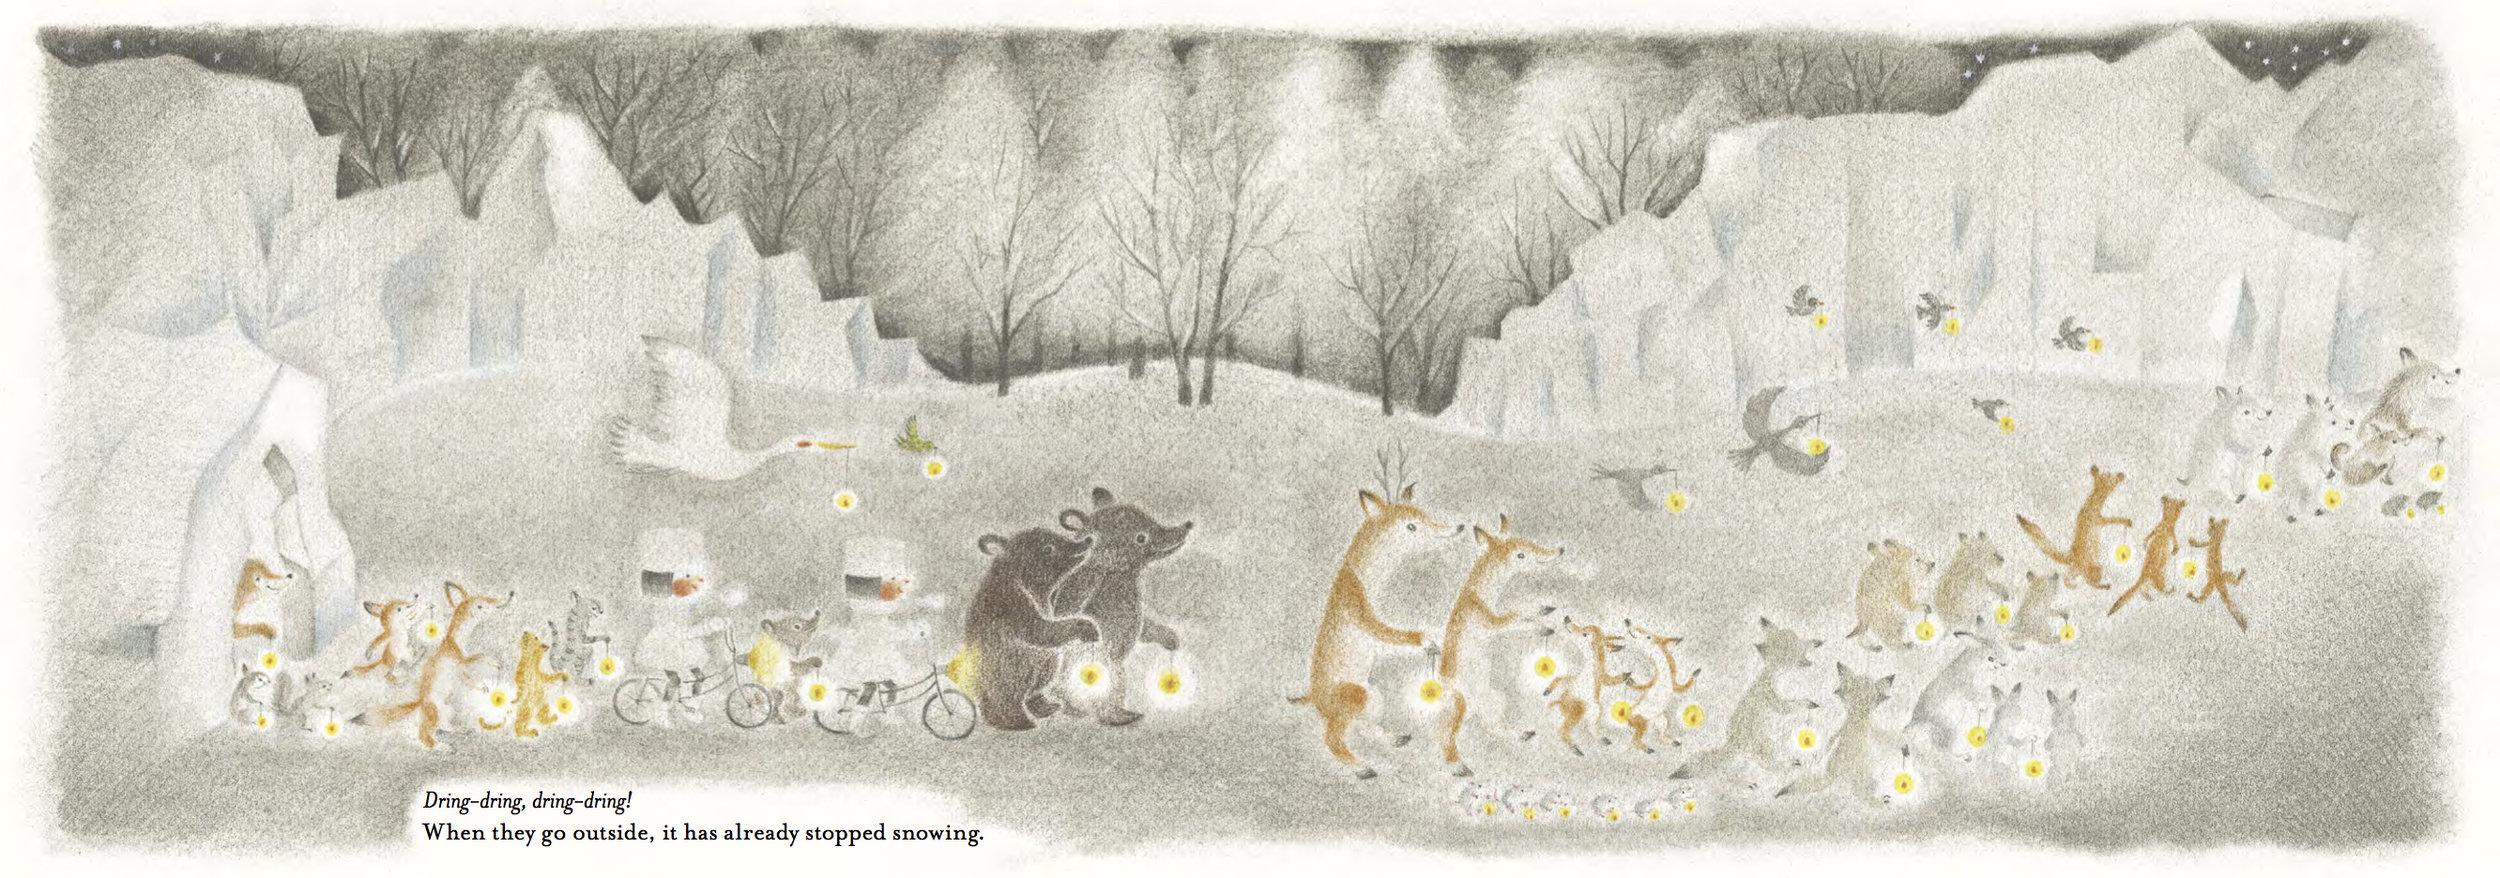 Image from Chirri & Chirra, The Snowy Day by Kaya Doi